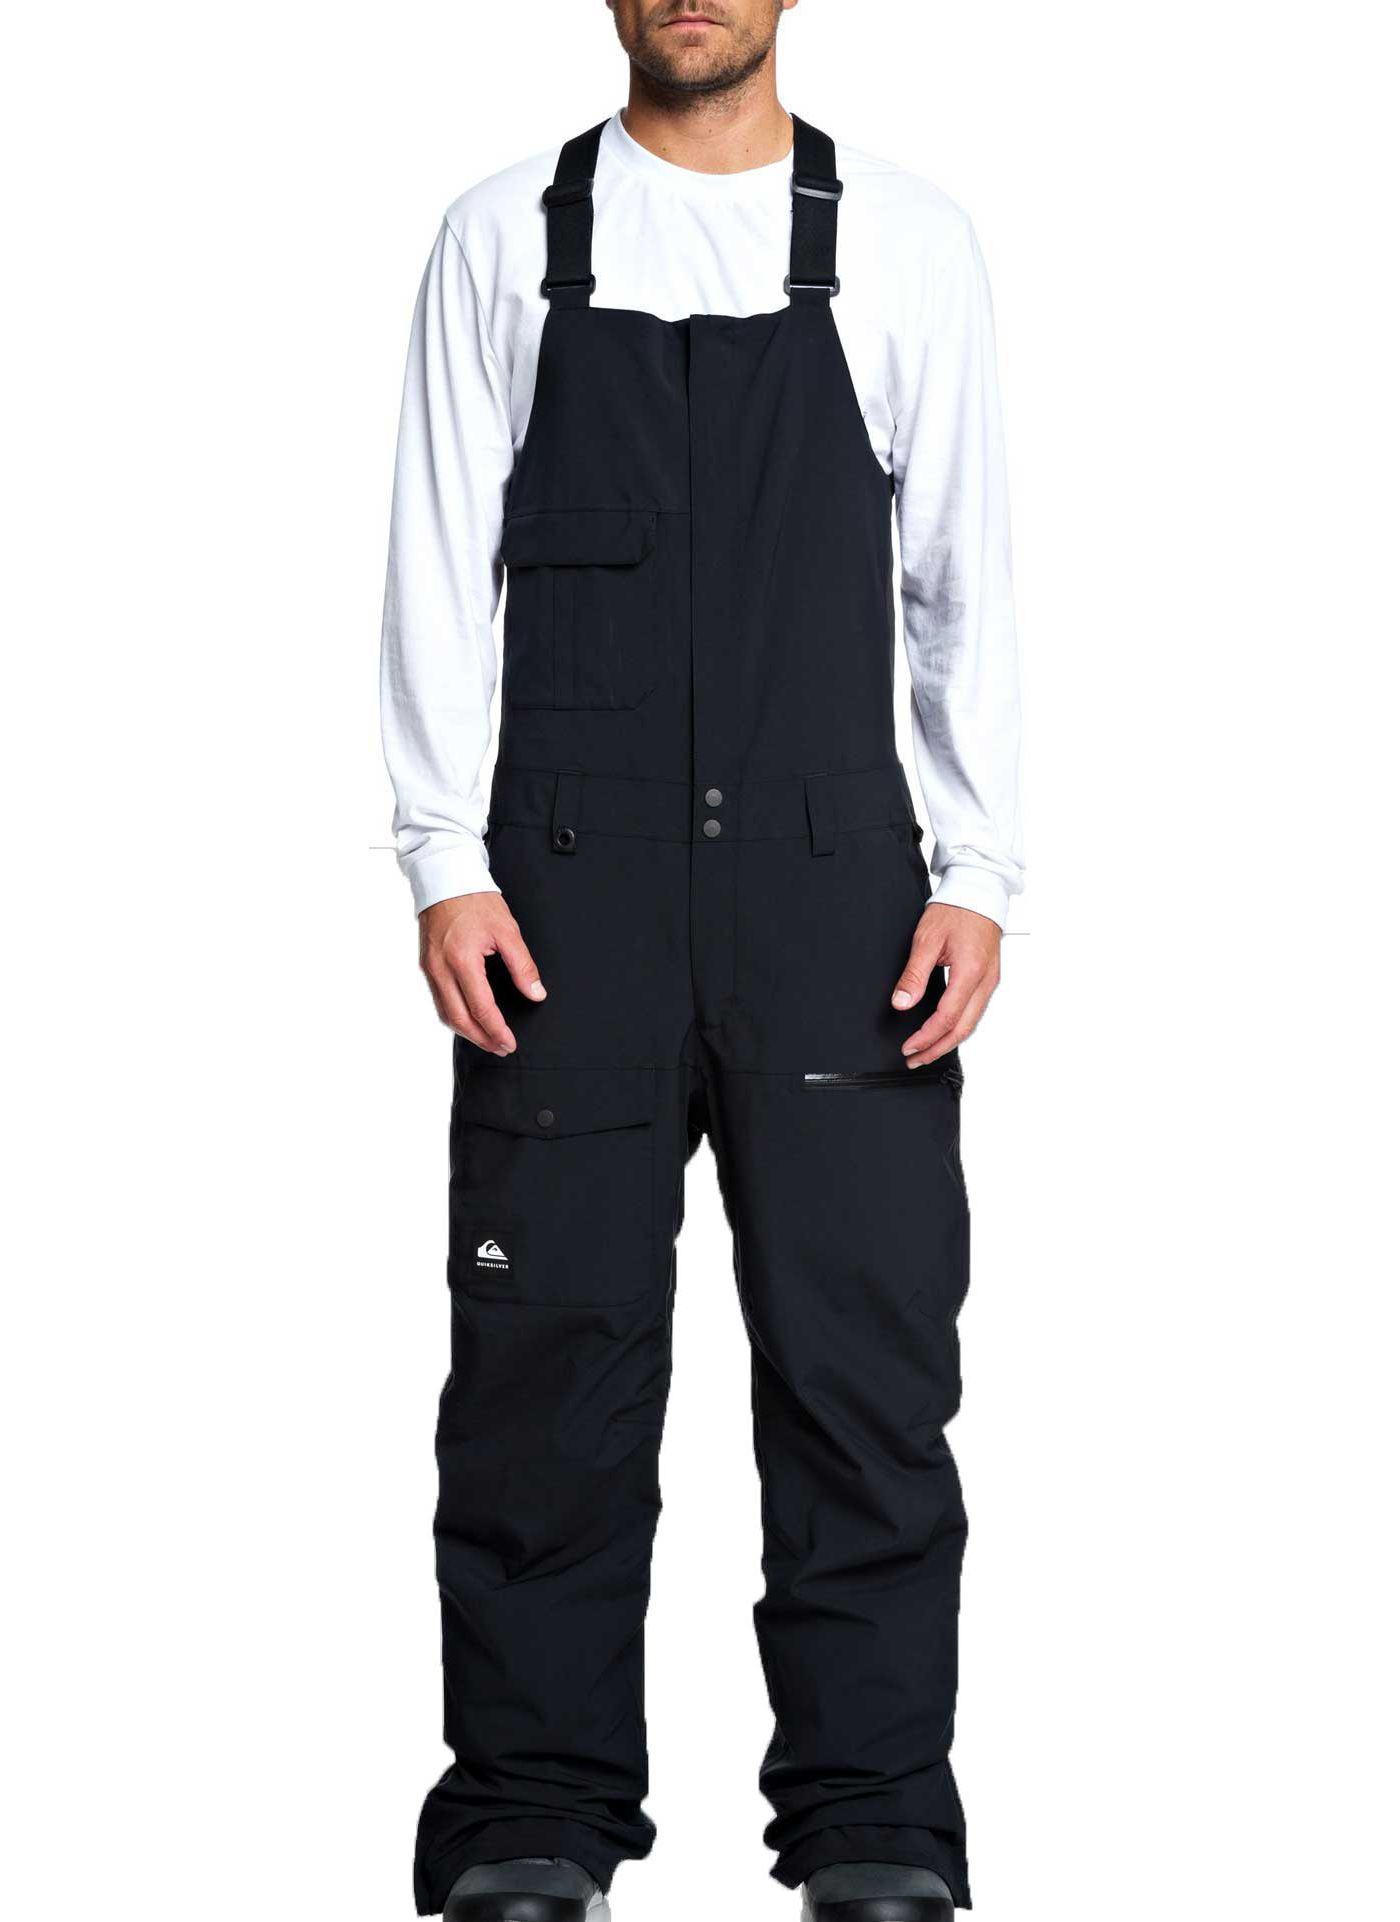 Quiksilver Men's Utility Snow Bib Pants